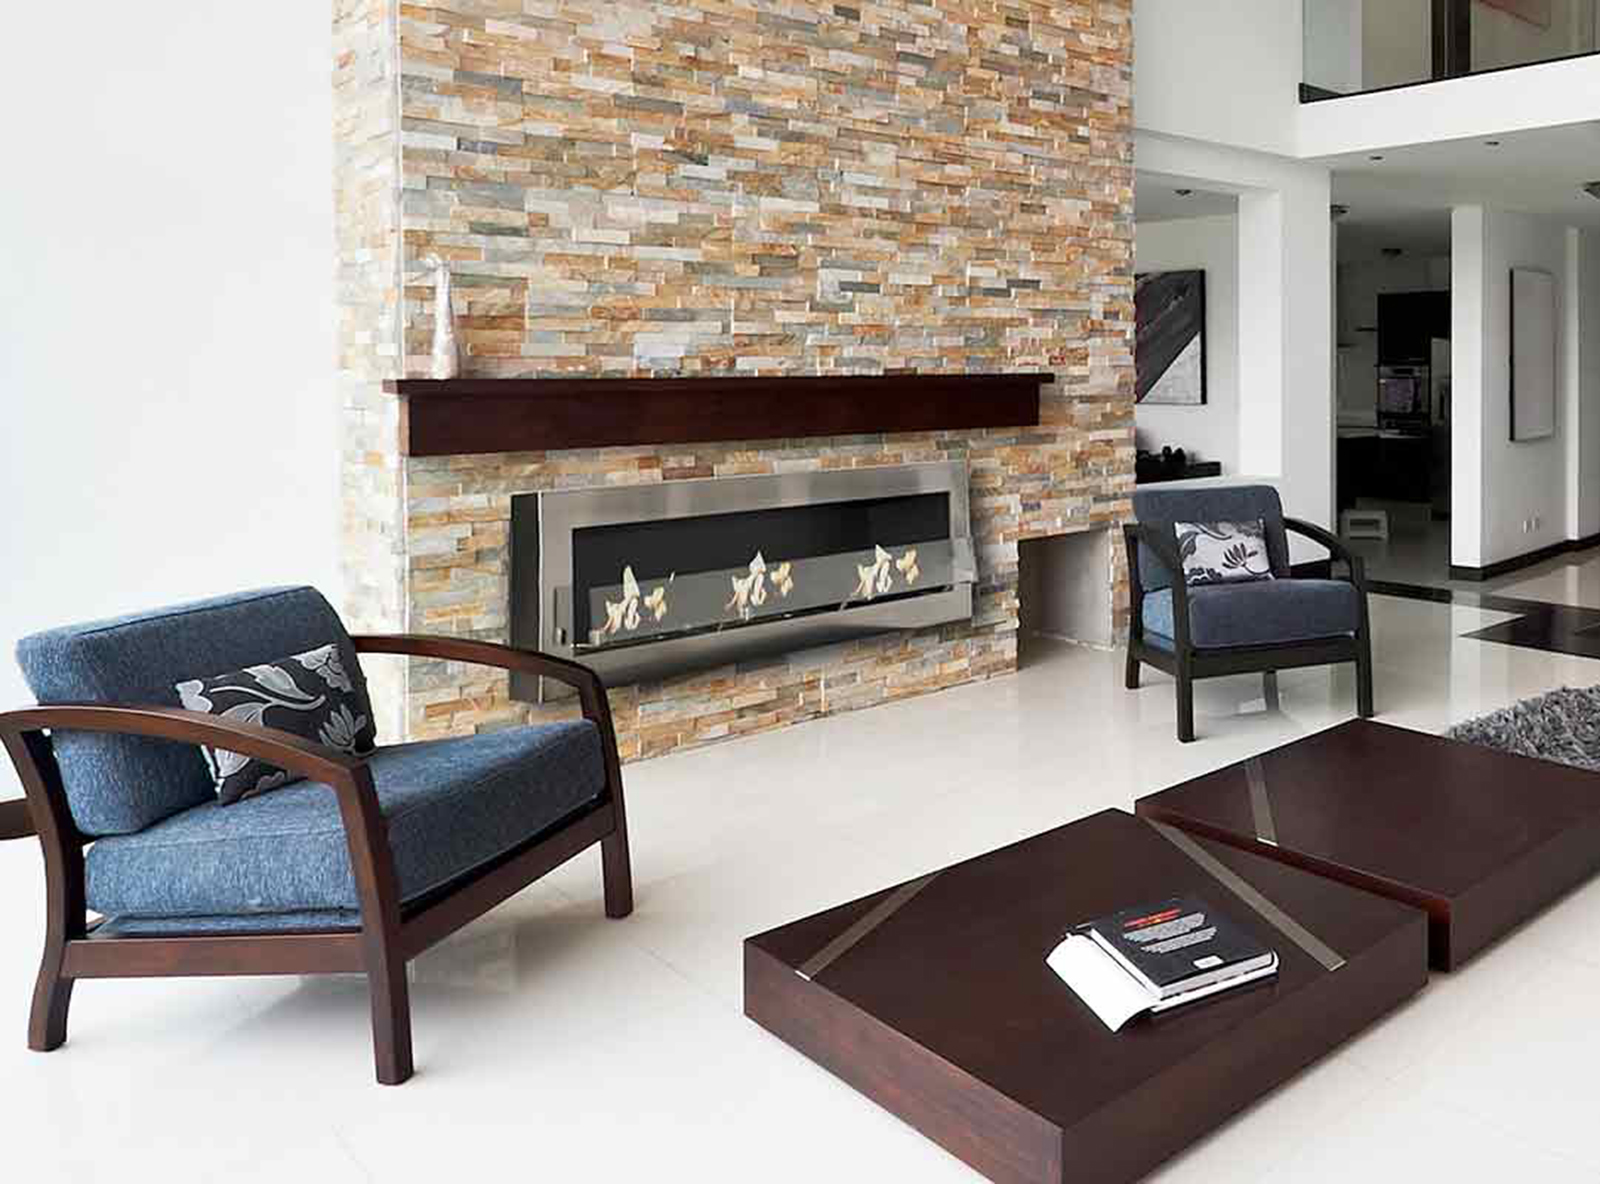 quelle nergie choisir chemin e bois gaz ou thanol. Black Bedroom Furniture Sets. Home Design Ideas